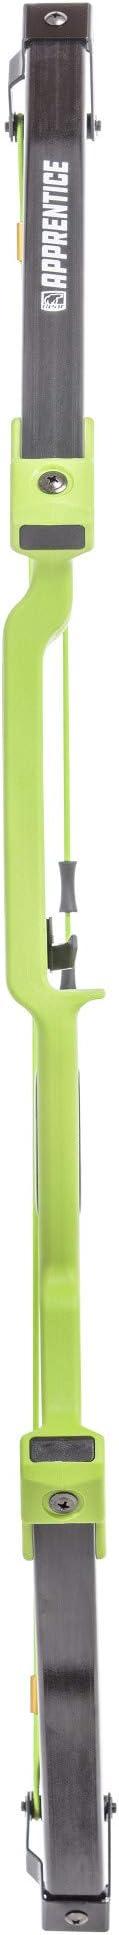 Bear Archery  product image 5